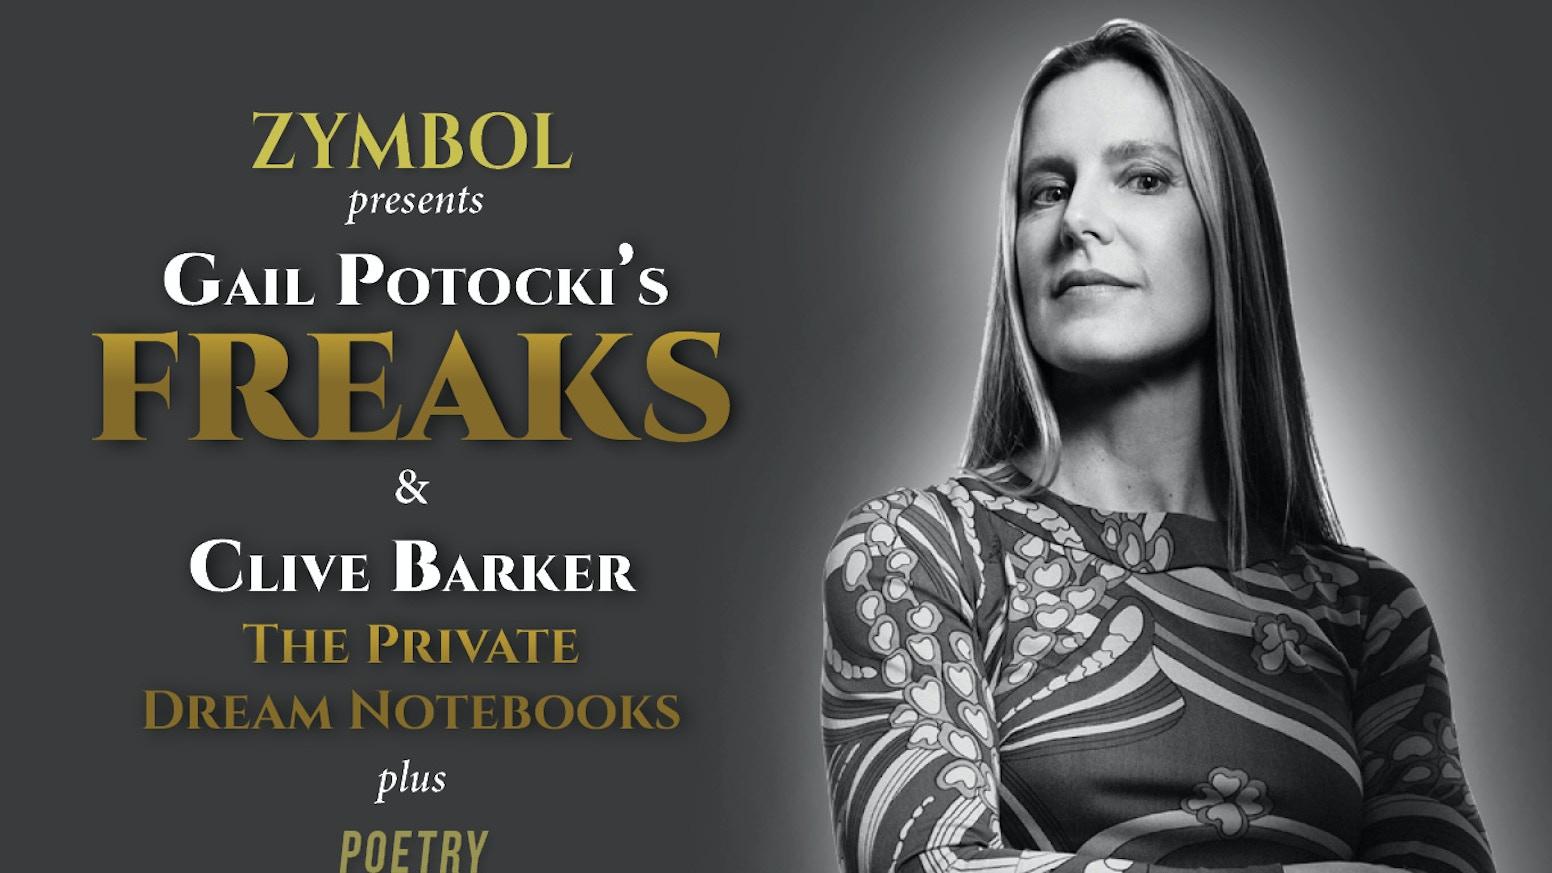 ZYMBOL Magazine: Symbolist master artist GAIL POTOCKI reveals her FREAKS series. CLIVE BARKER's Dream Notebooks. Best new literature.